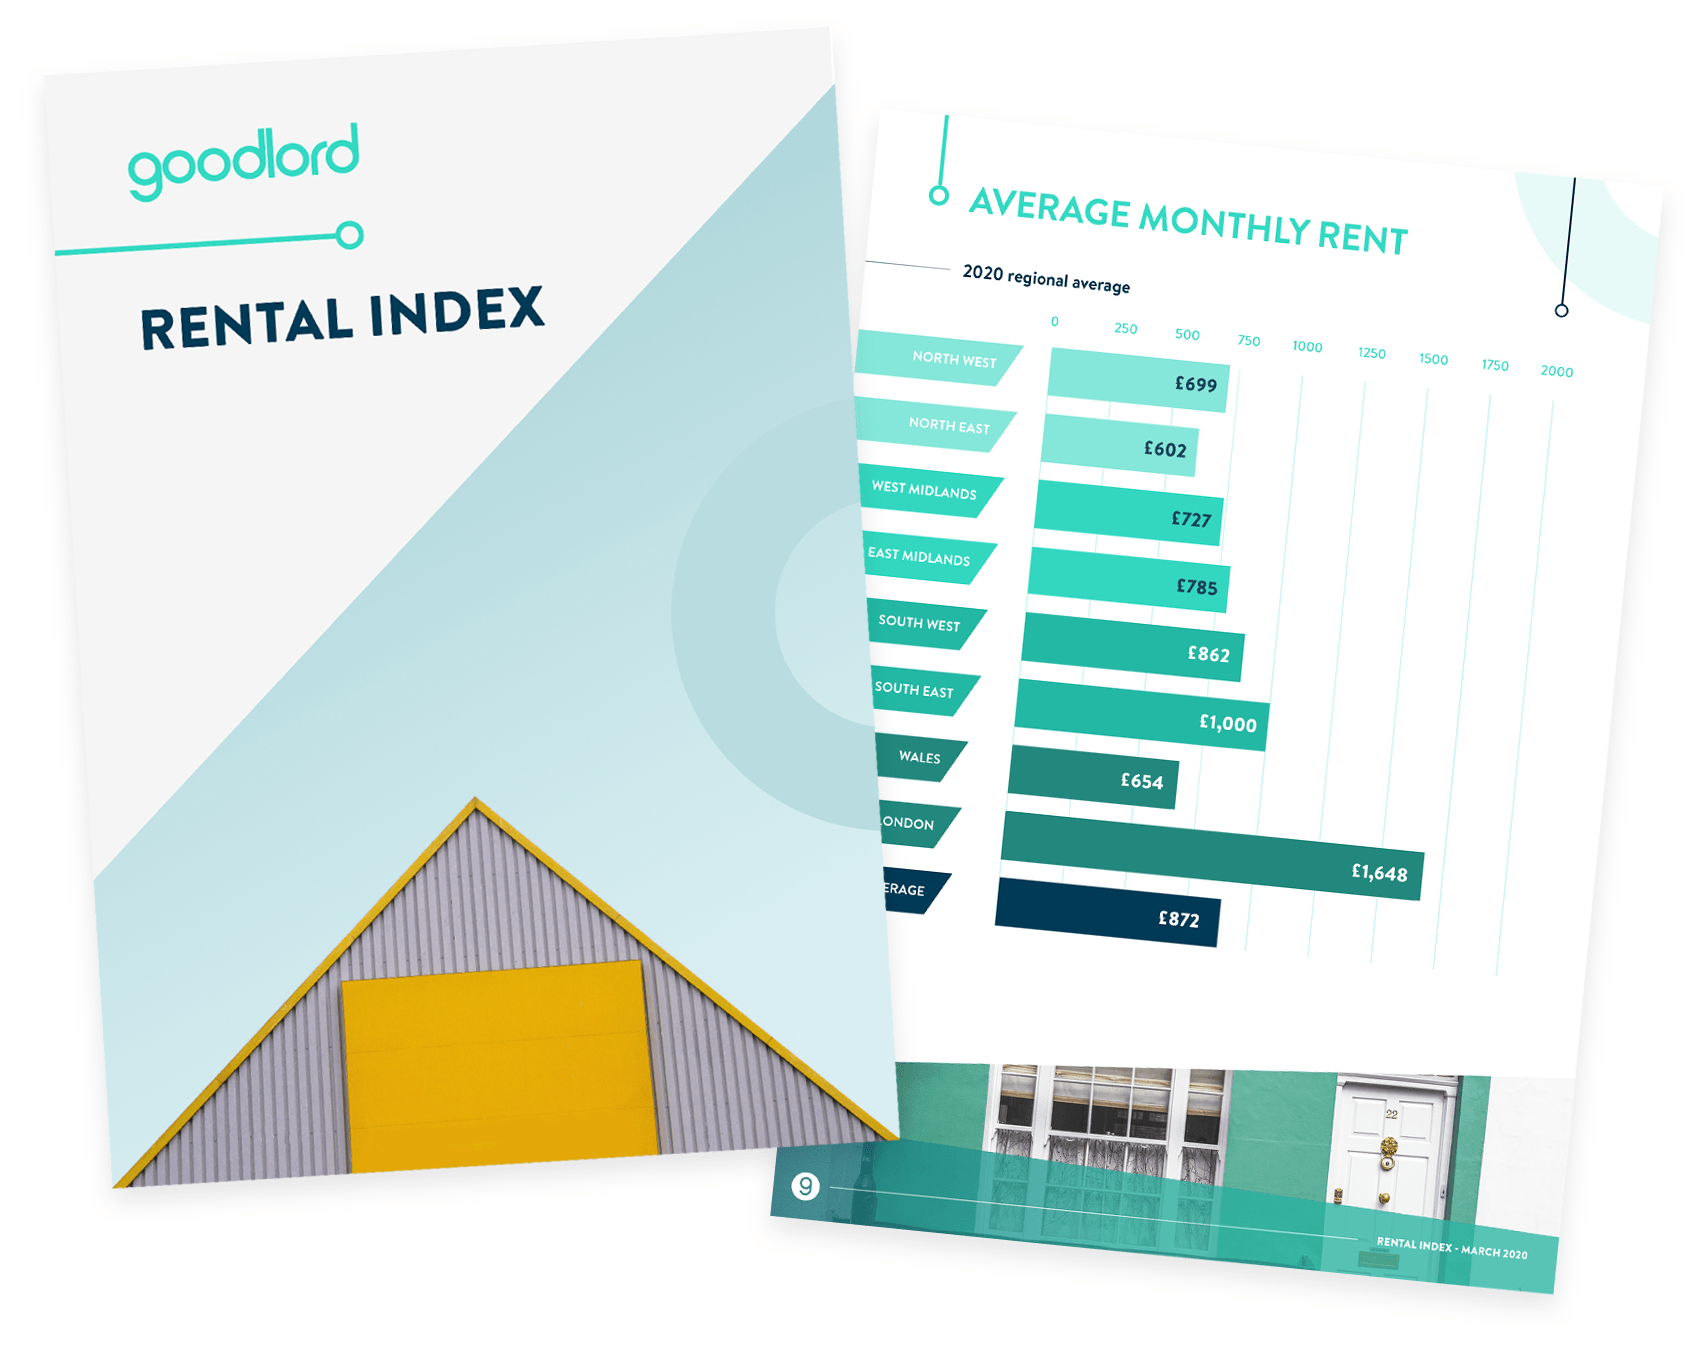 Goodlord Rental Index August